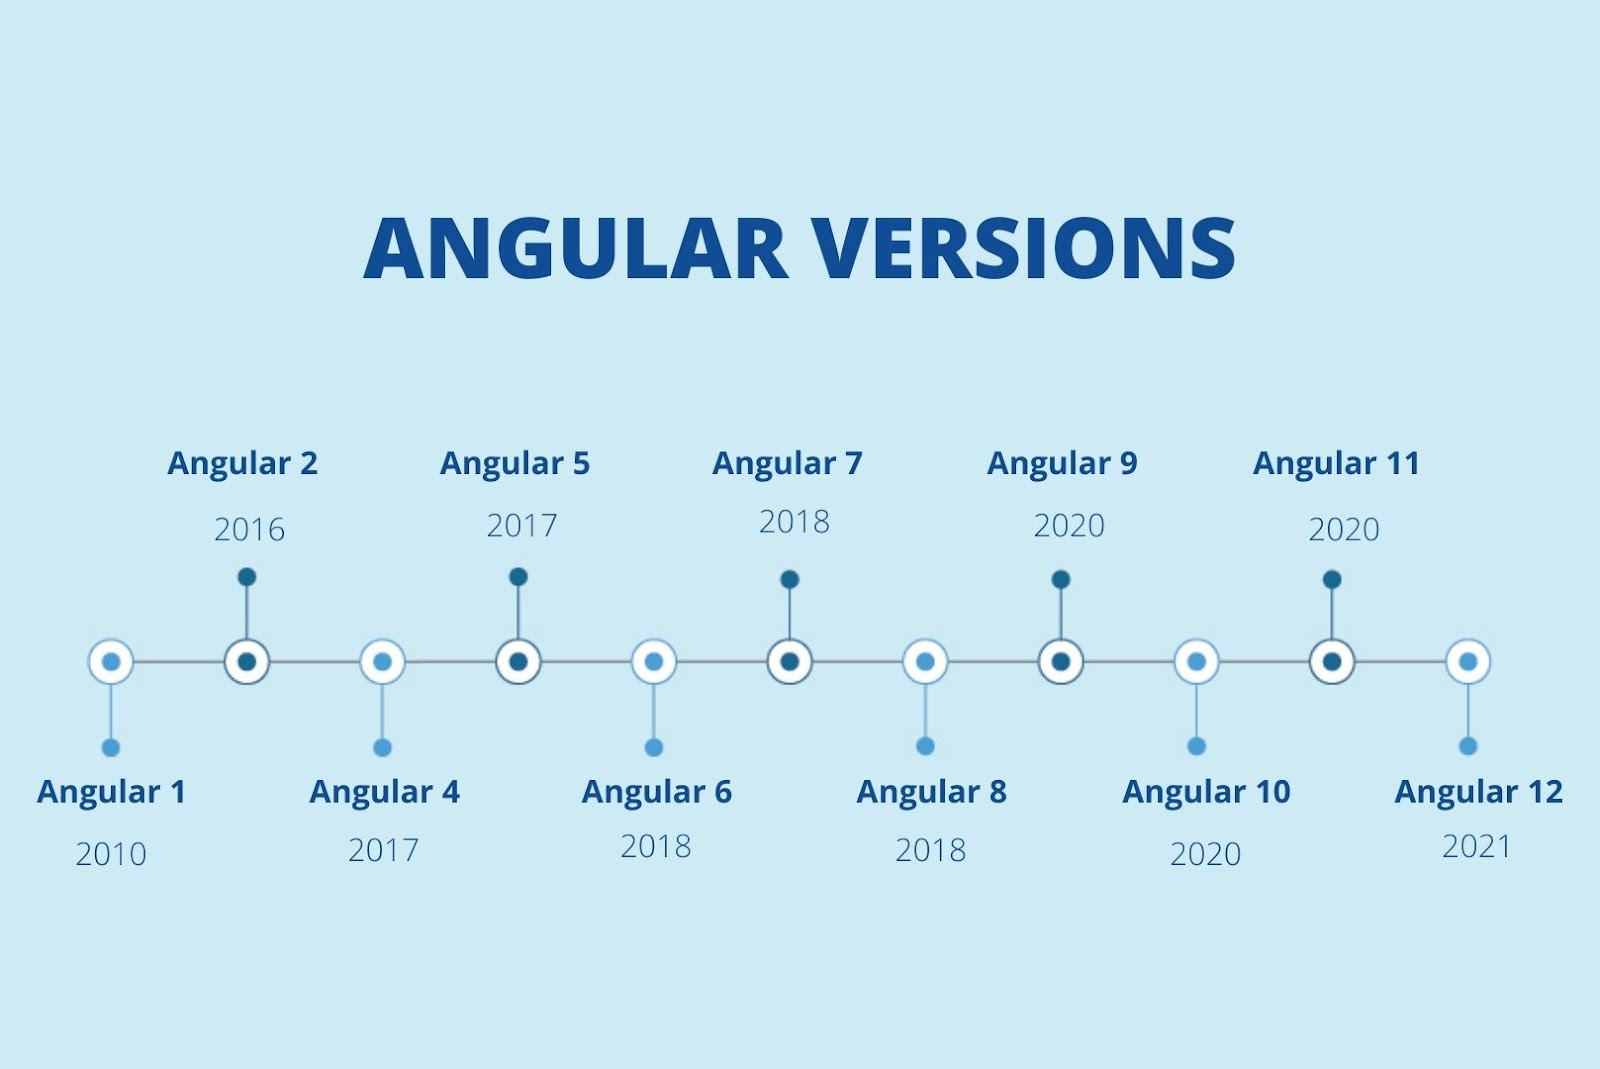 Angular versions of web development